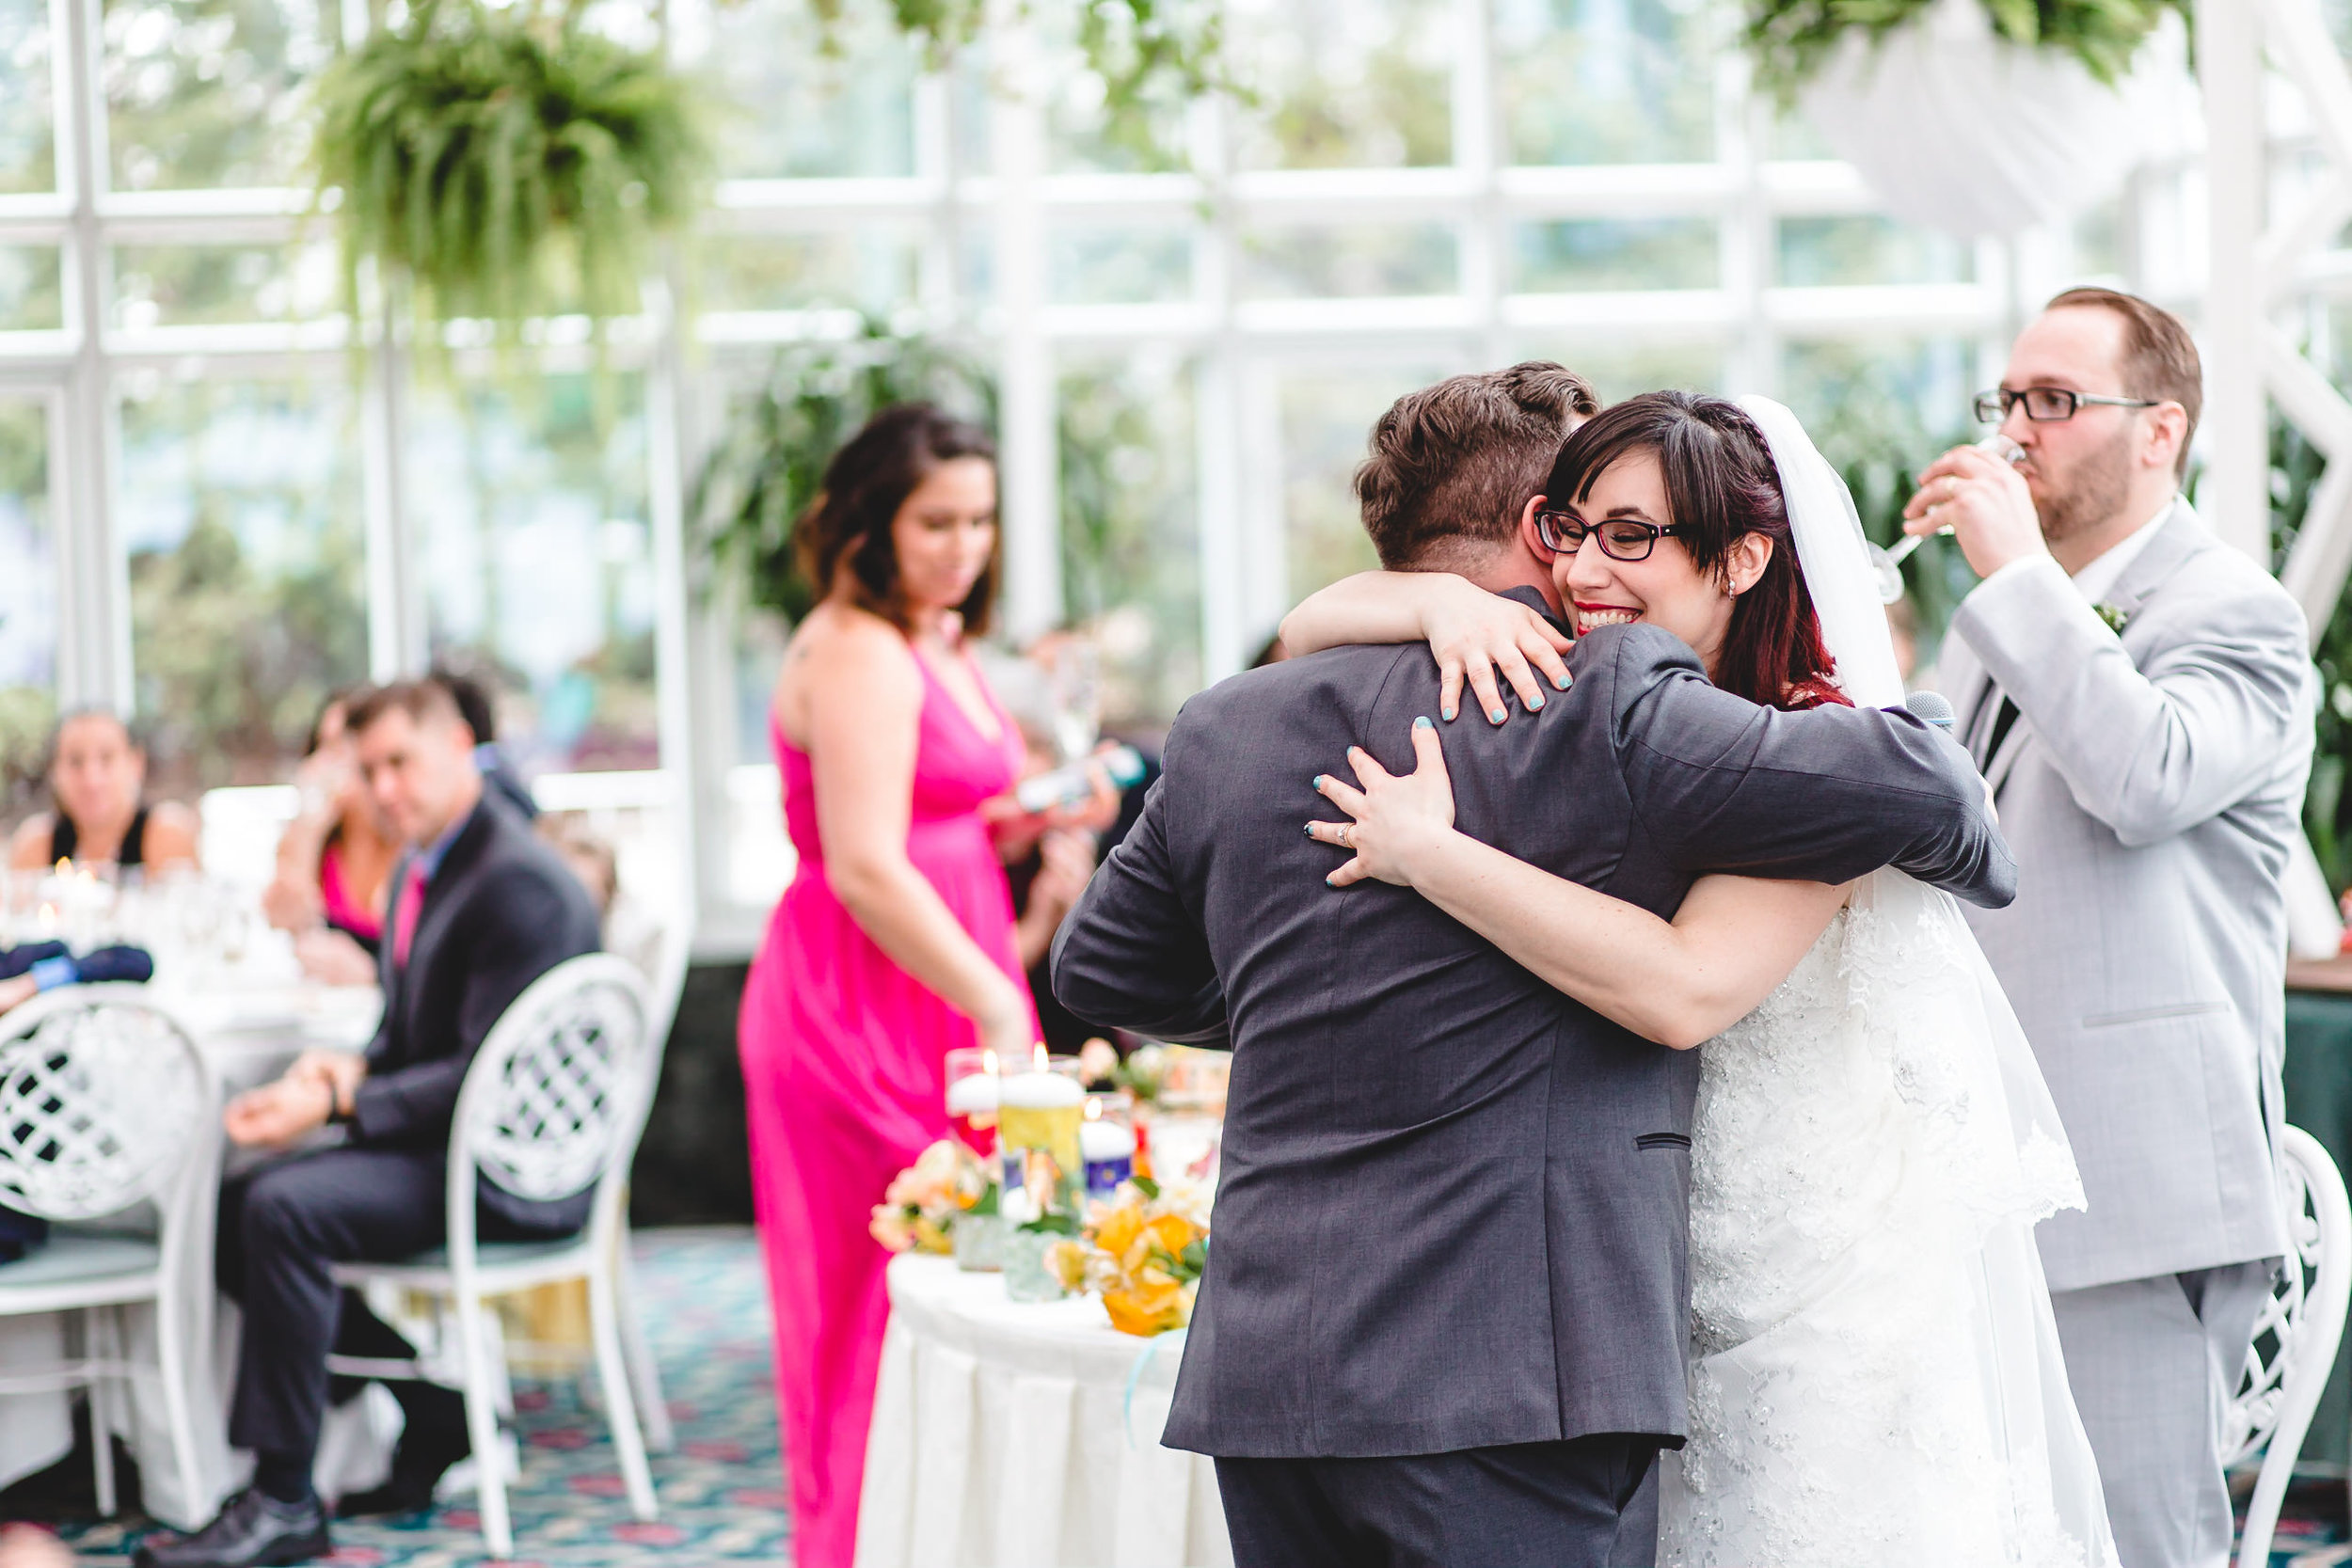 daniel_nydick_nj_photographer_headshot_wedding_event_family-26.jpg